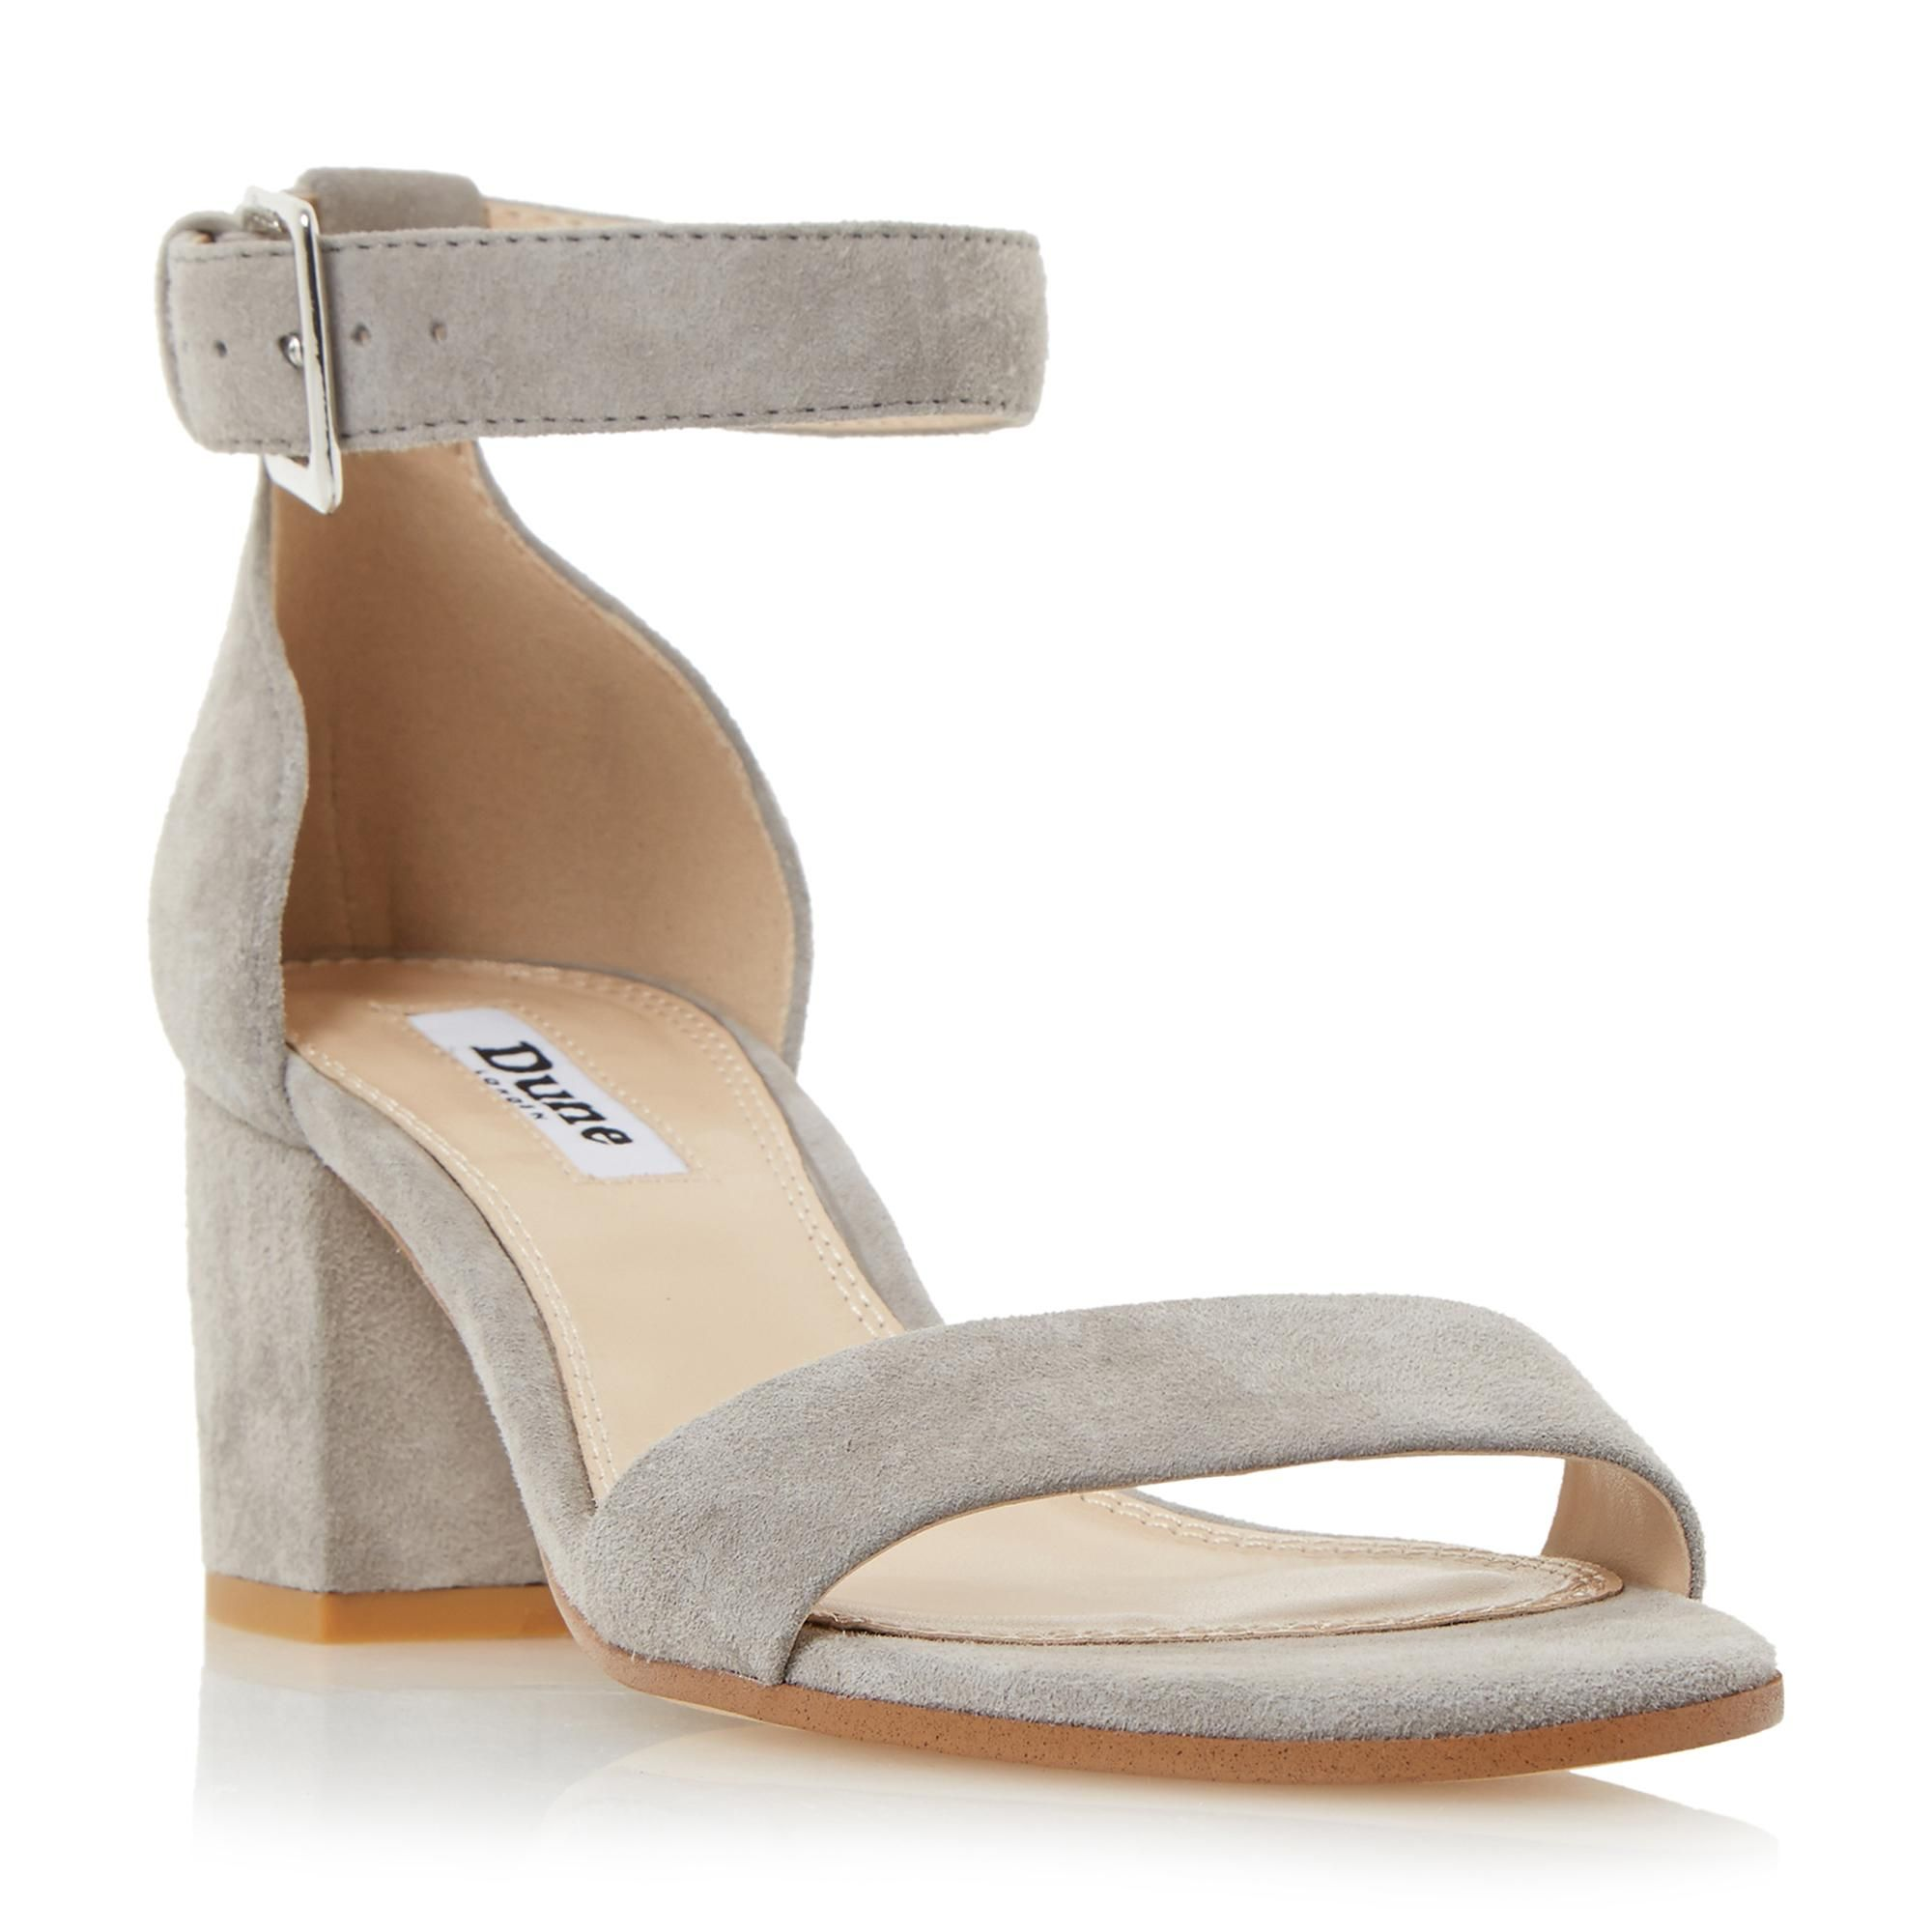 922d38298621 DUNE LADIES JAYGO - Two Part Block Heel Sandal - grey